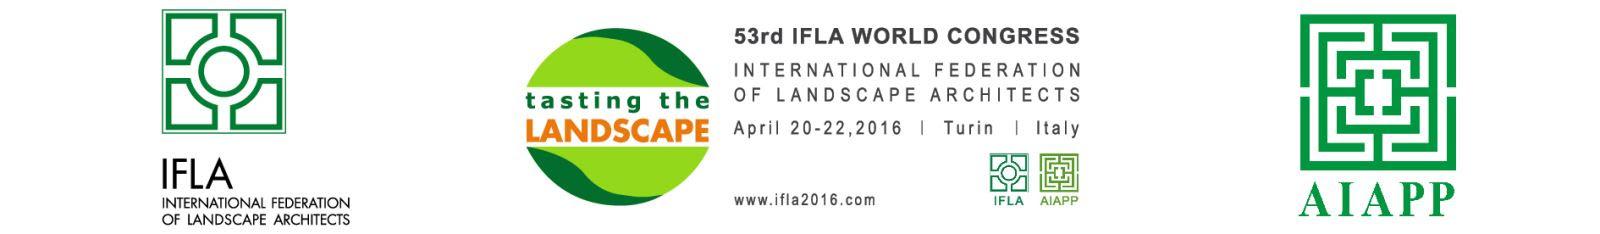 TASTING THE LANDSCAPE 53° IFLA World Congress International